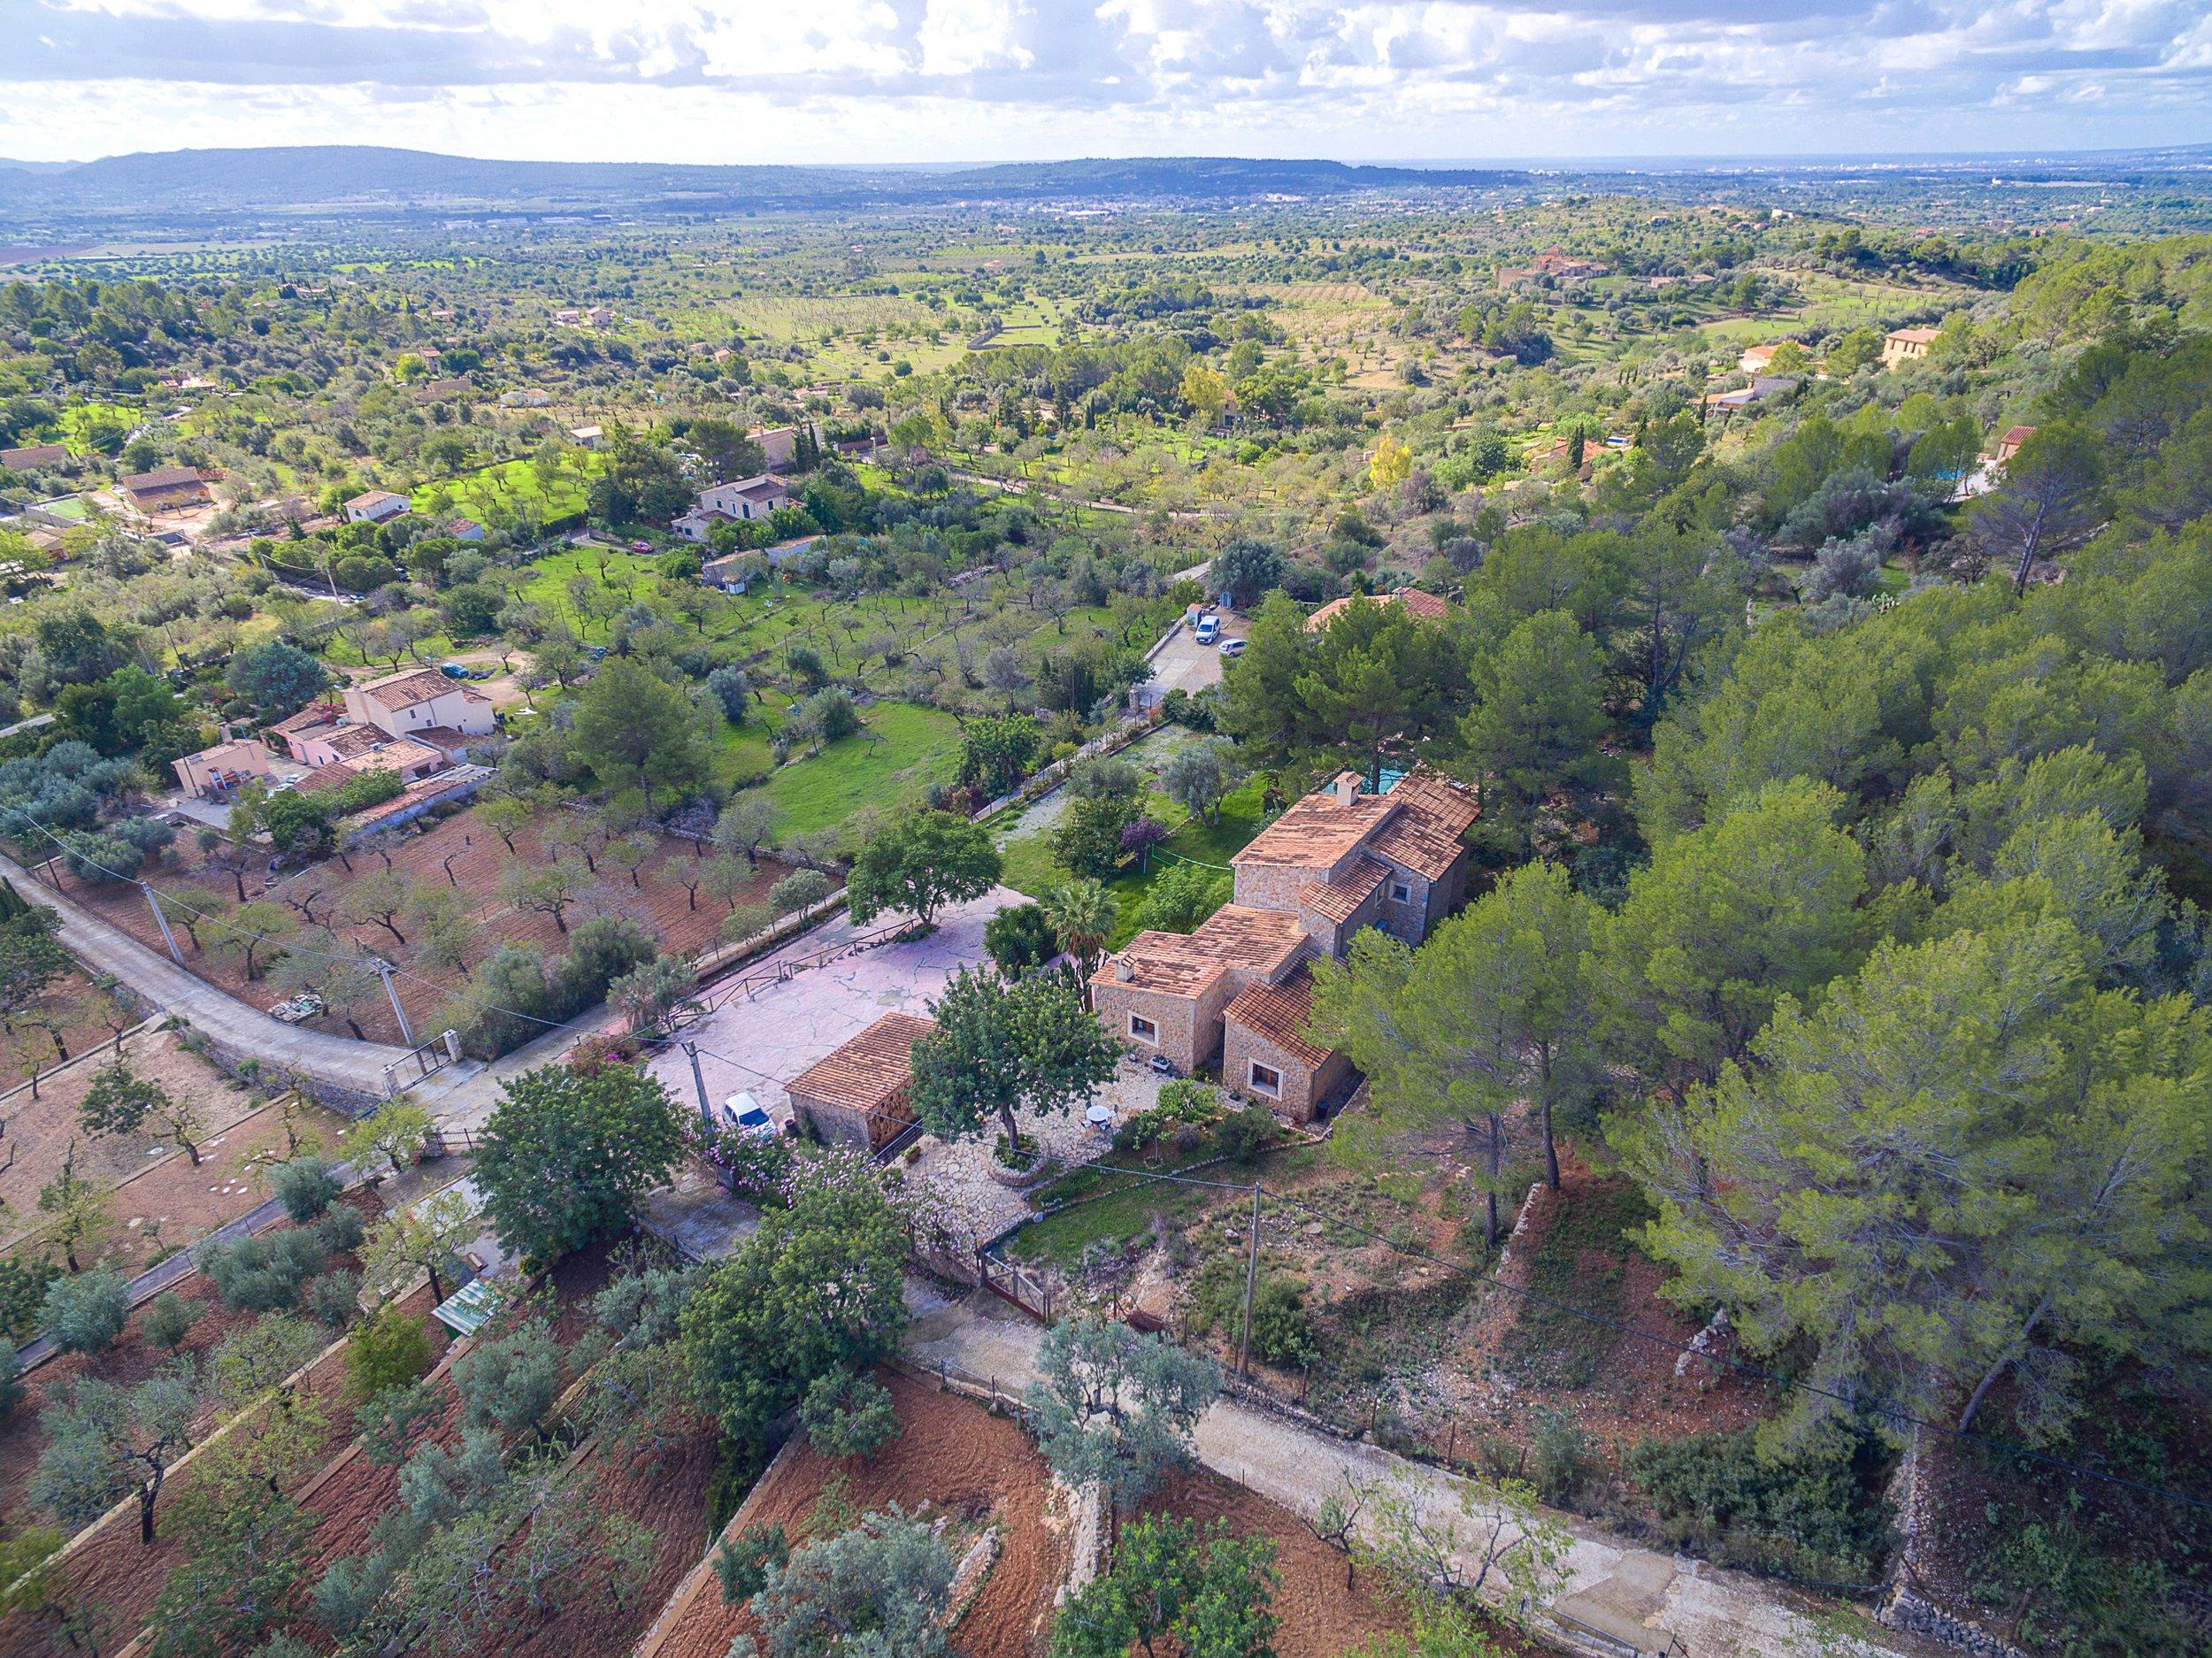 Maison de vacances Villa Cirera in Alaro (2611793), Alaro, Majorque, Iles Baléares, Espagne, image 31